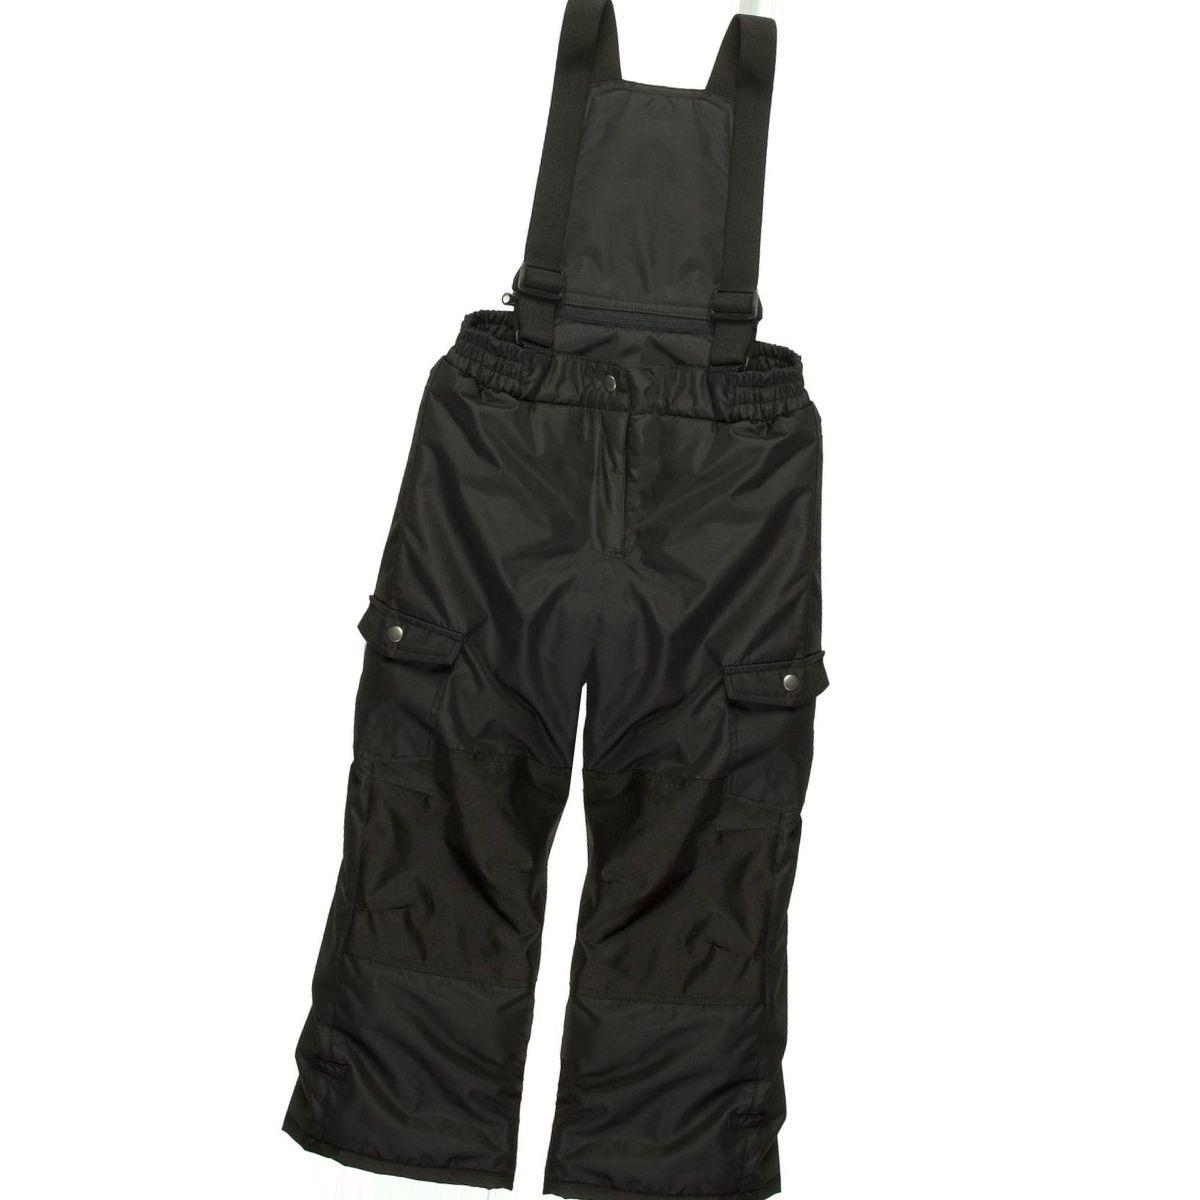 Stoic Ski & Snowboard Bib Pants - Boys'